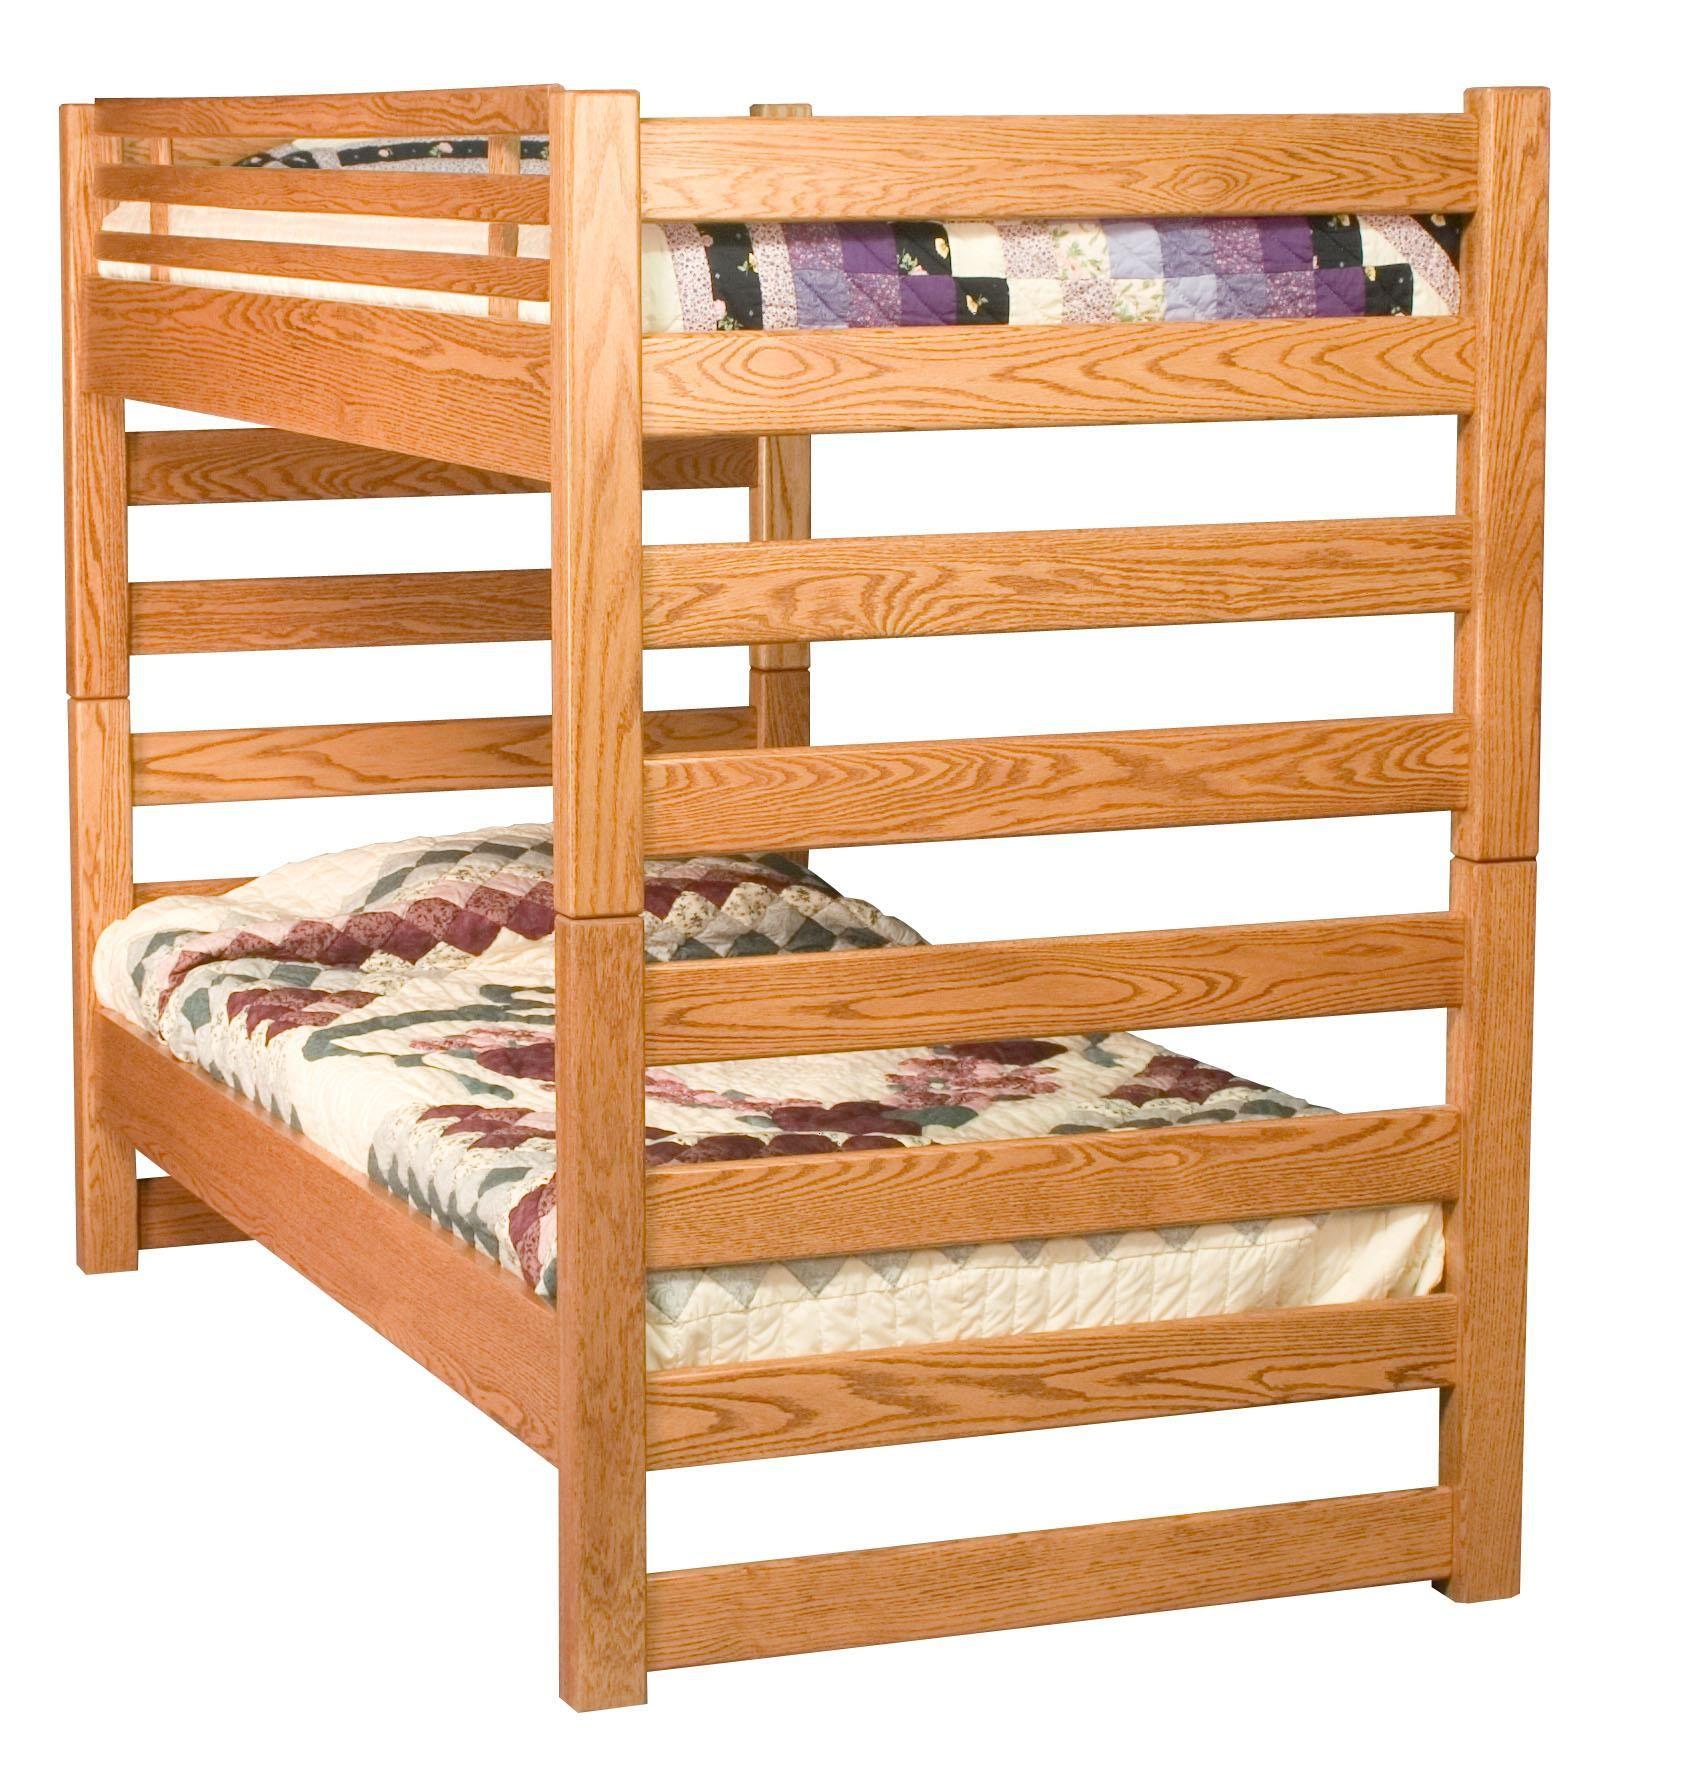 Amish ladder bunk bed